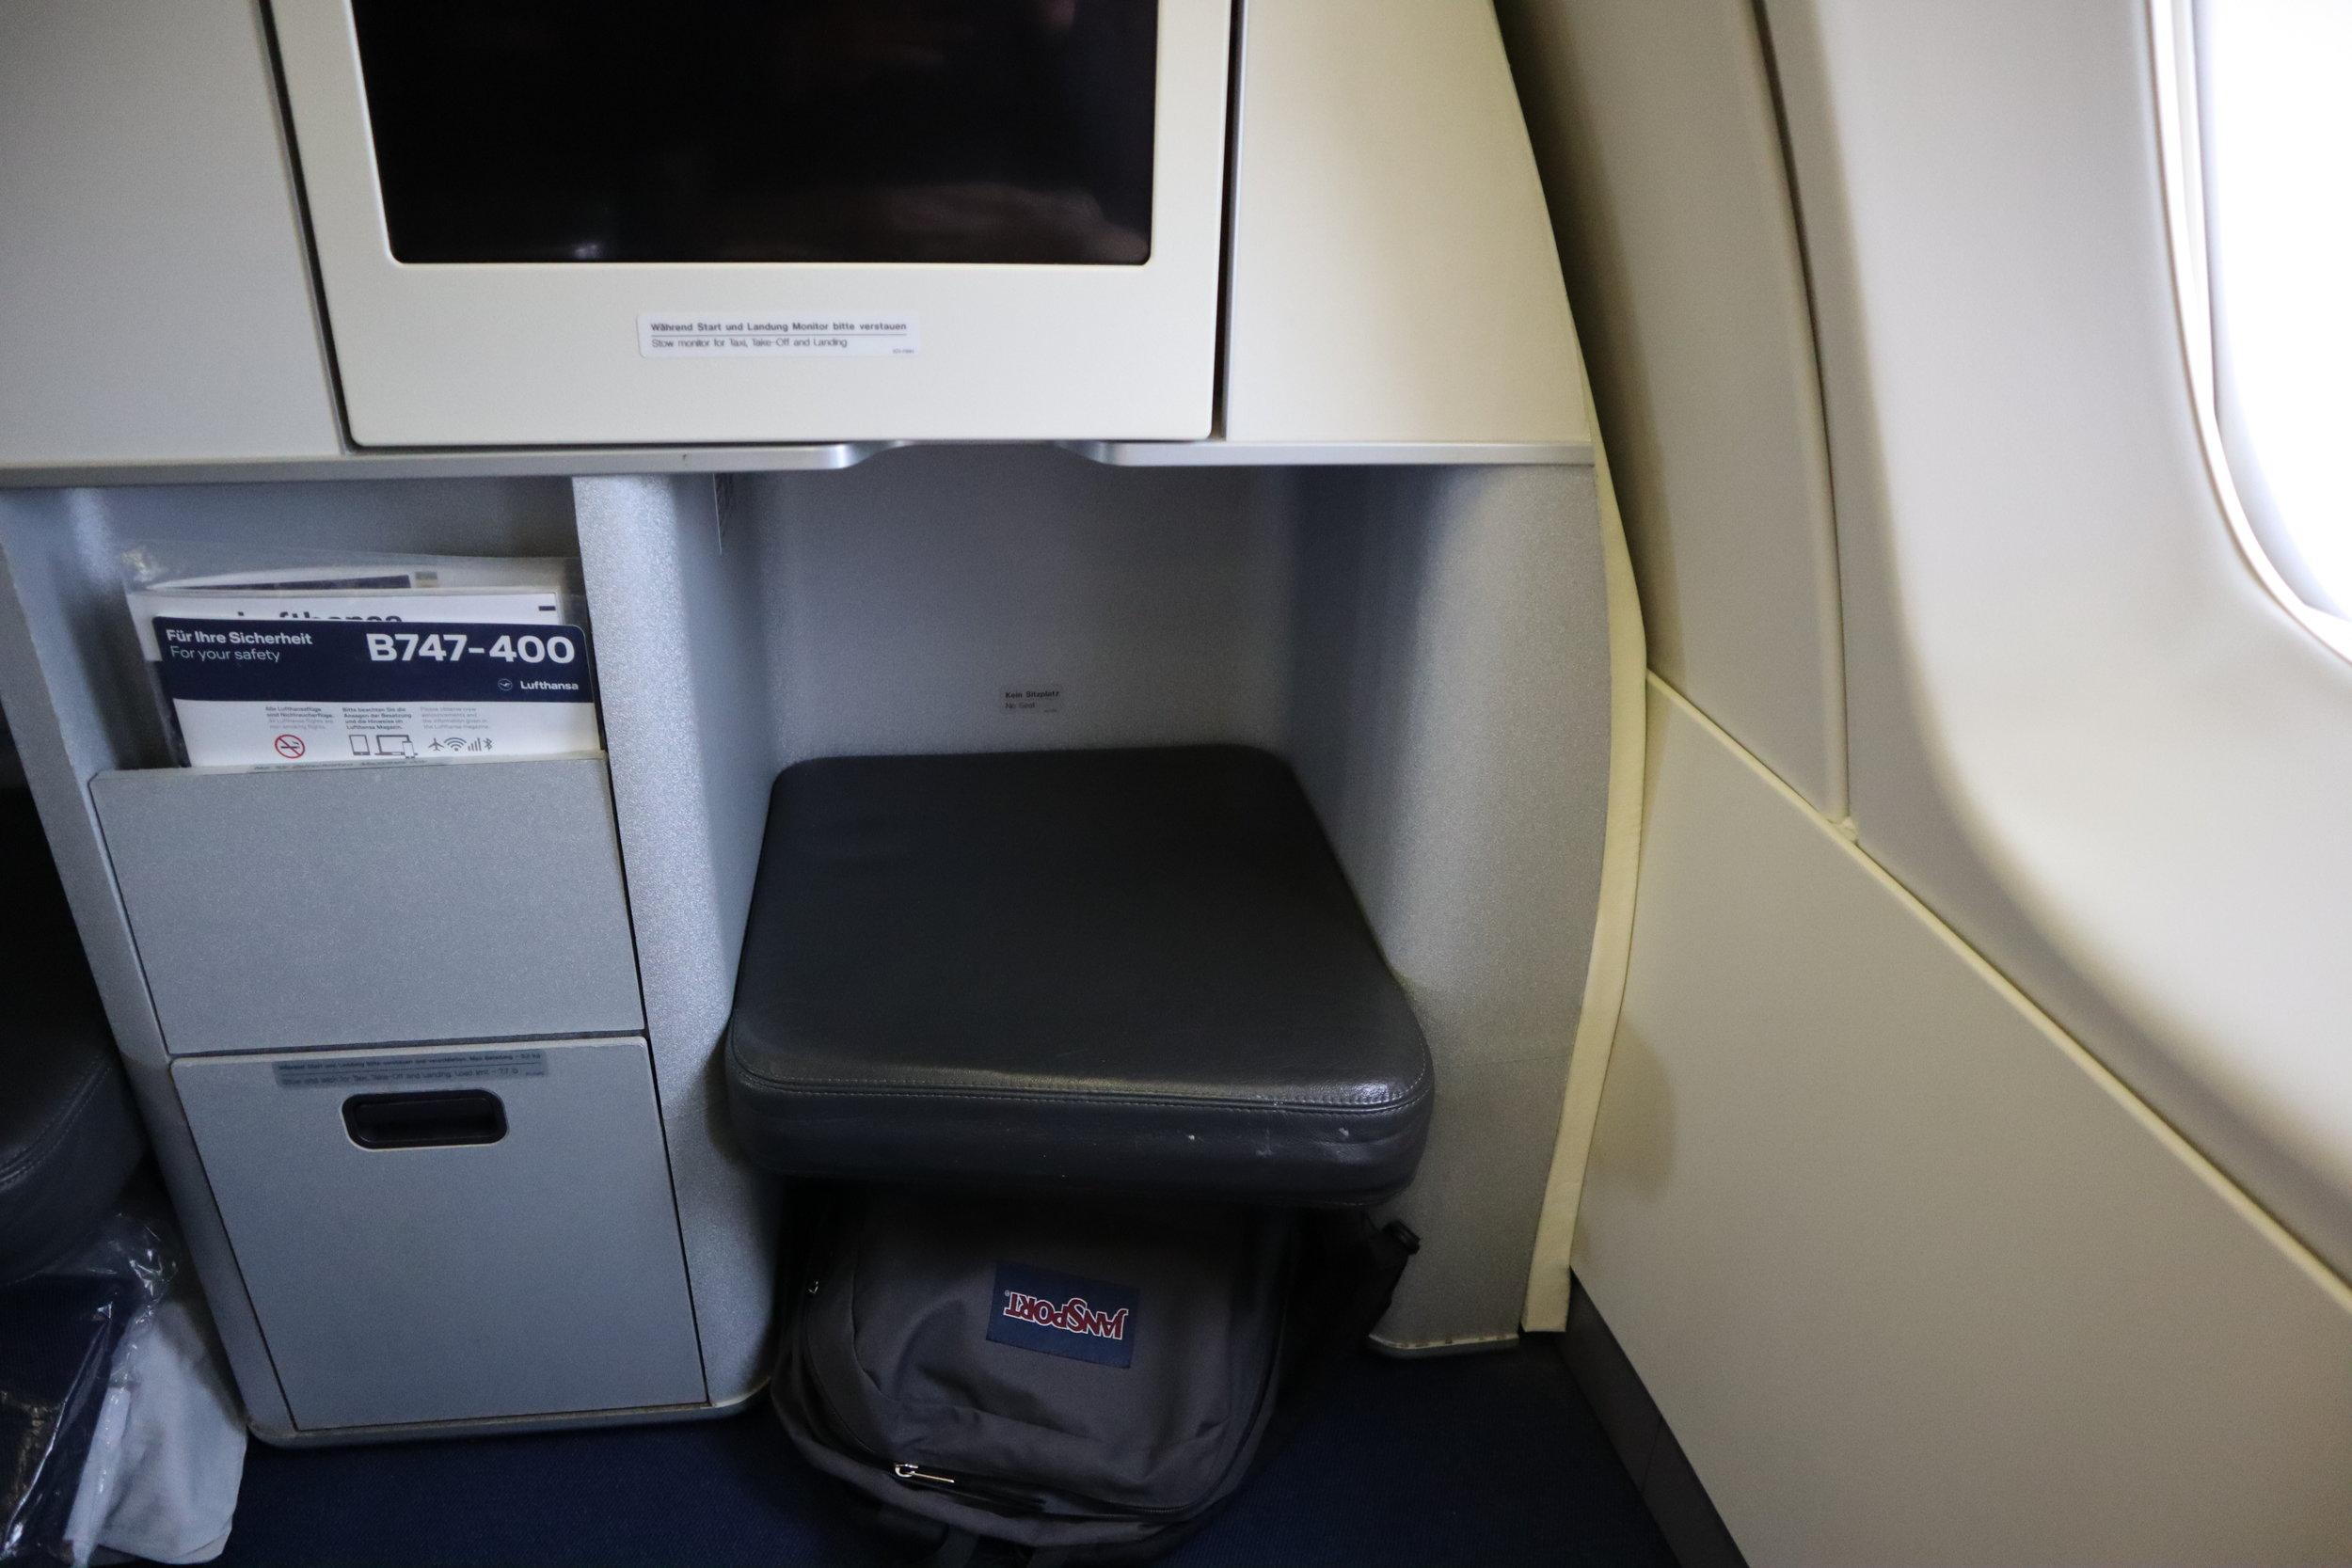 Lufthansa 747-400 business class – Legrest and storage